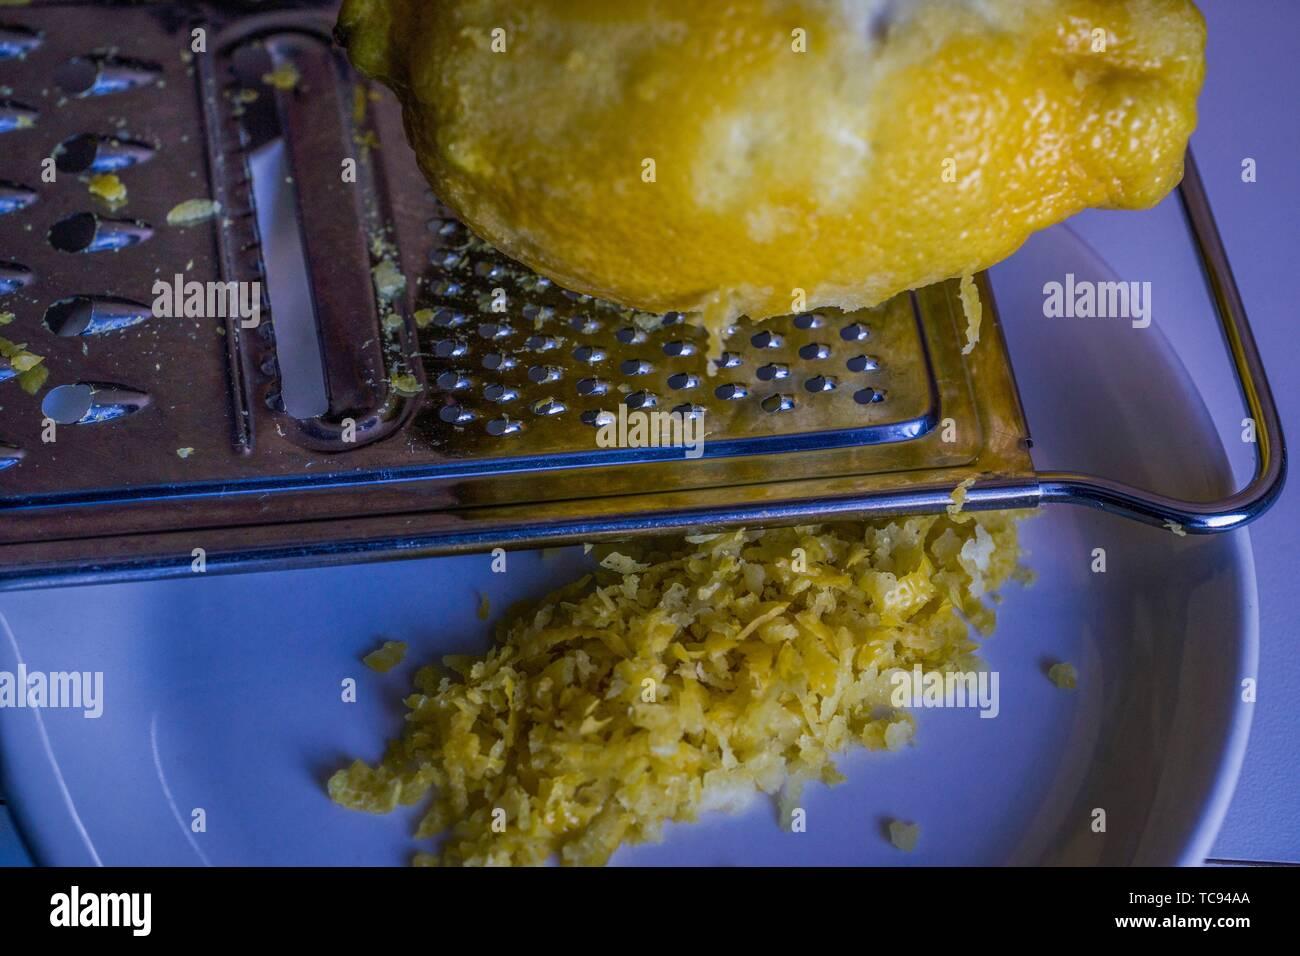 Lemon rind (zest) being grated. Macro image. - Stock Image